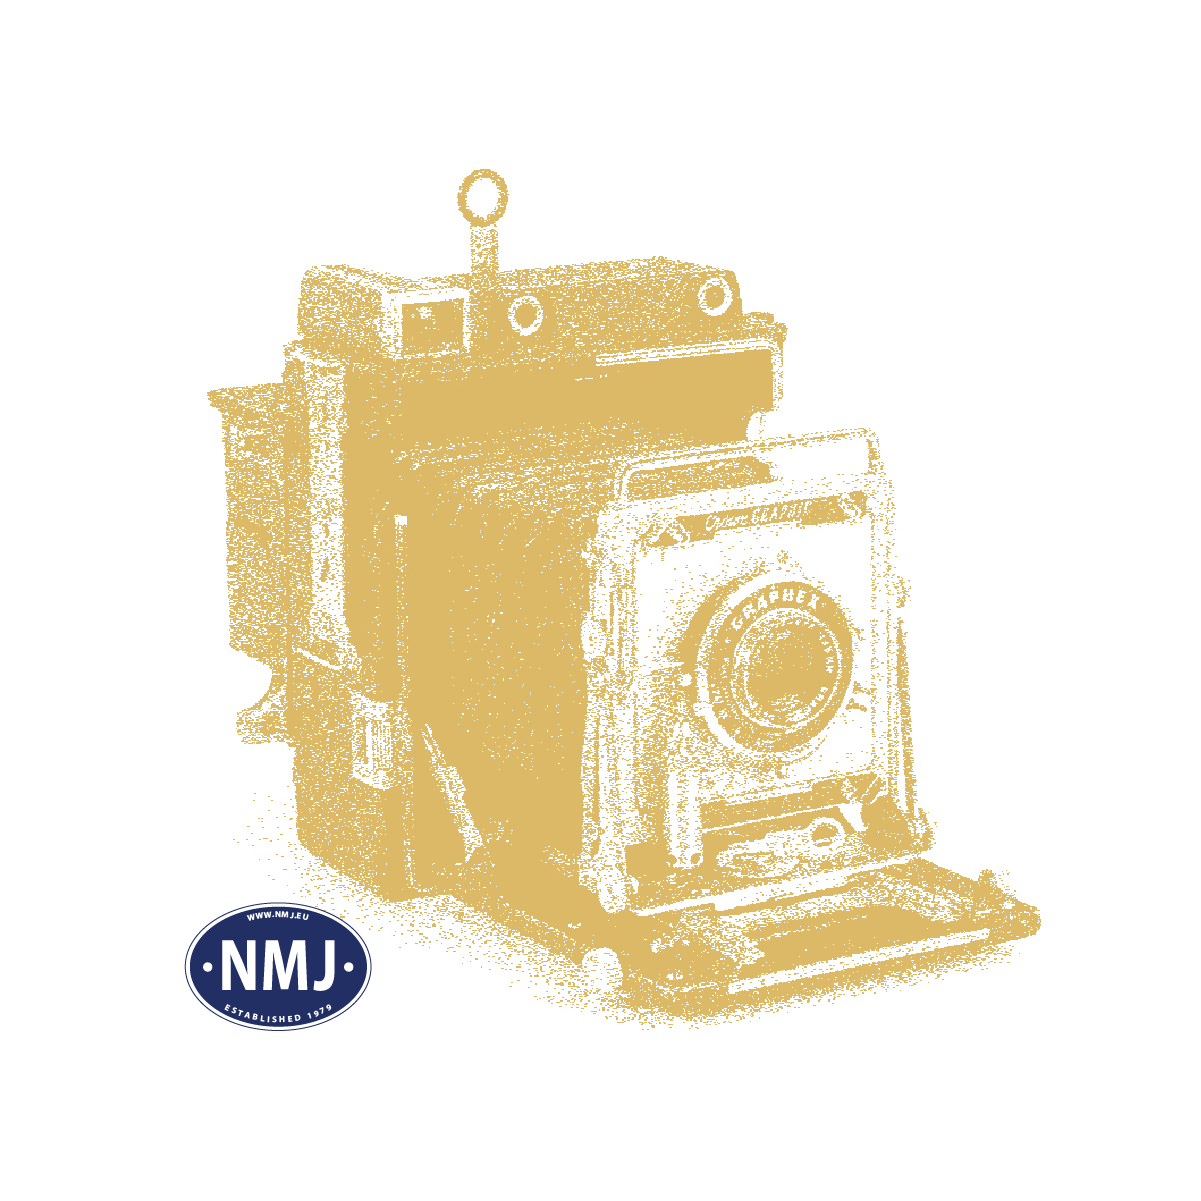 NMJT90013 - NMJ Topline NSB Di3a 614, Gammeldesign, DC